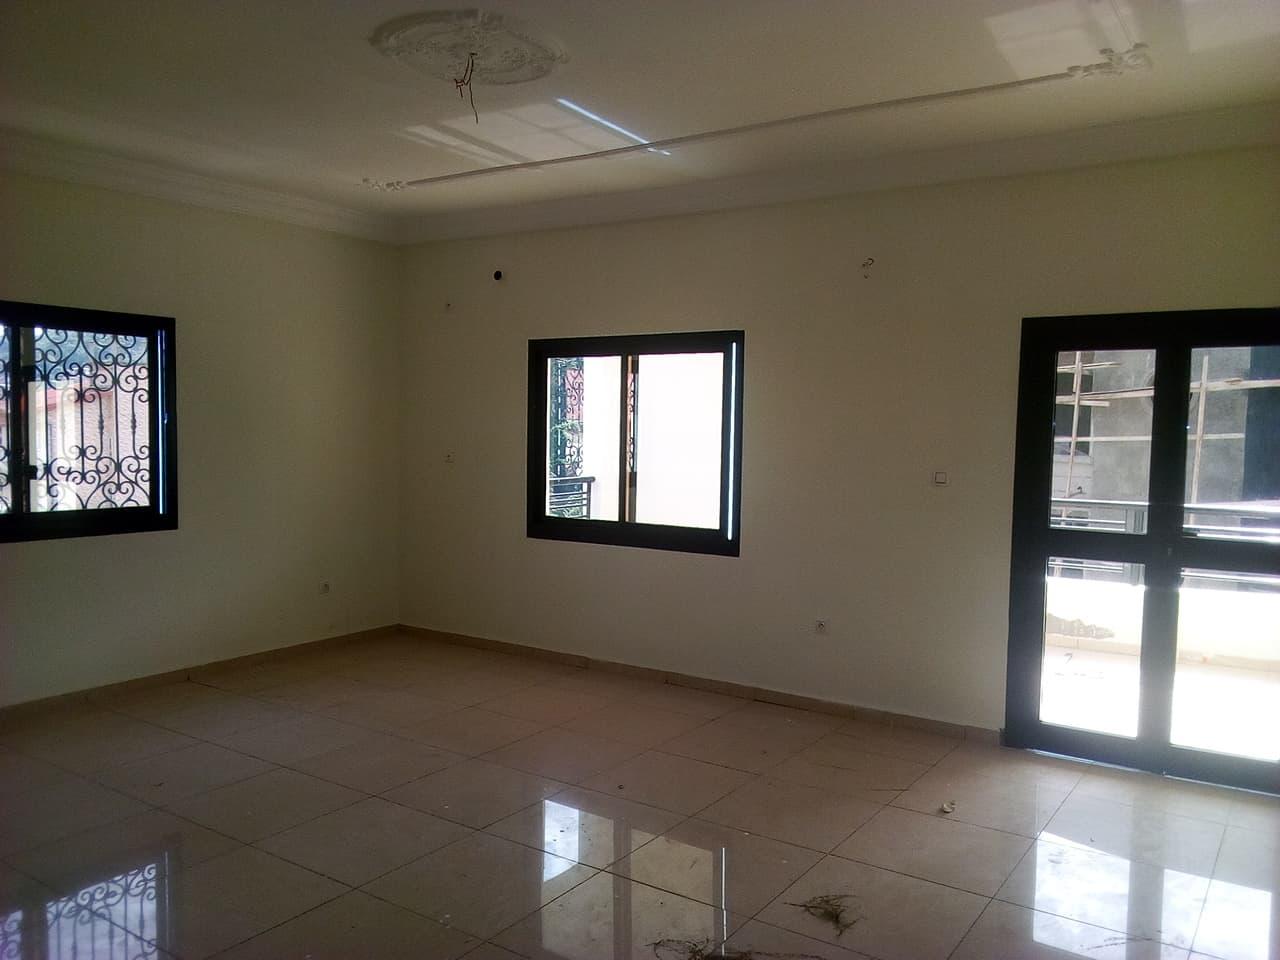 Apartment to rent - Yaoundé, Bastos, golf - 1 living room(s), 3 bedroom(s), 4 bathroom(s) - 800 000 FCFA / month